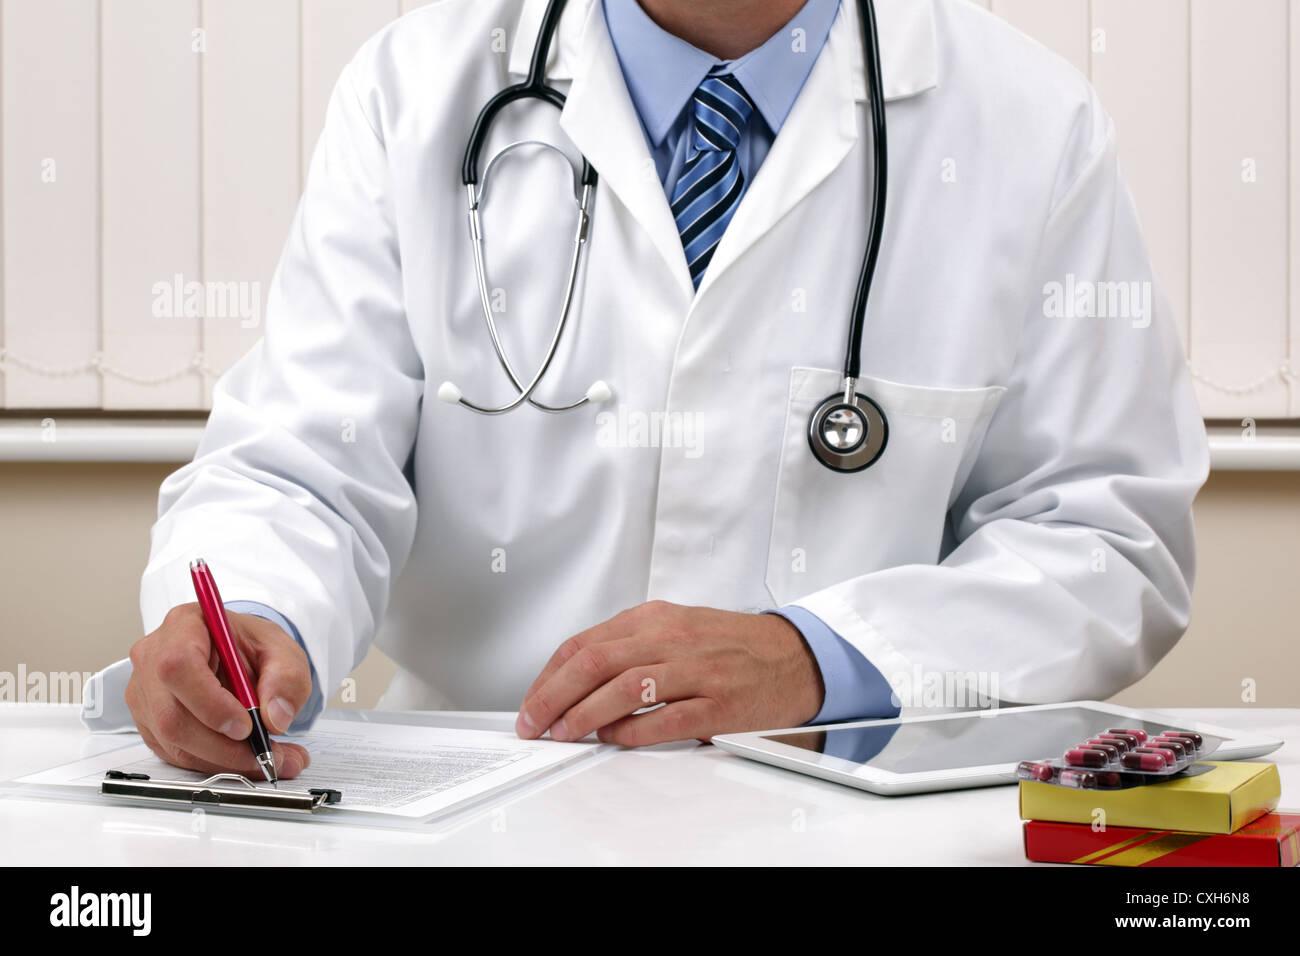 Médico Escribir una receta o examen médico notas Imagen De Stock